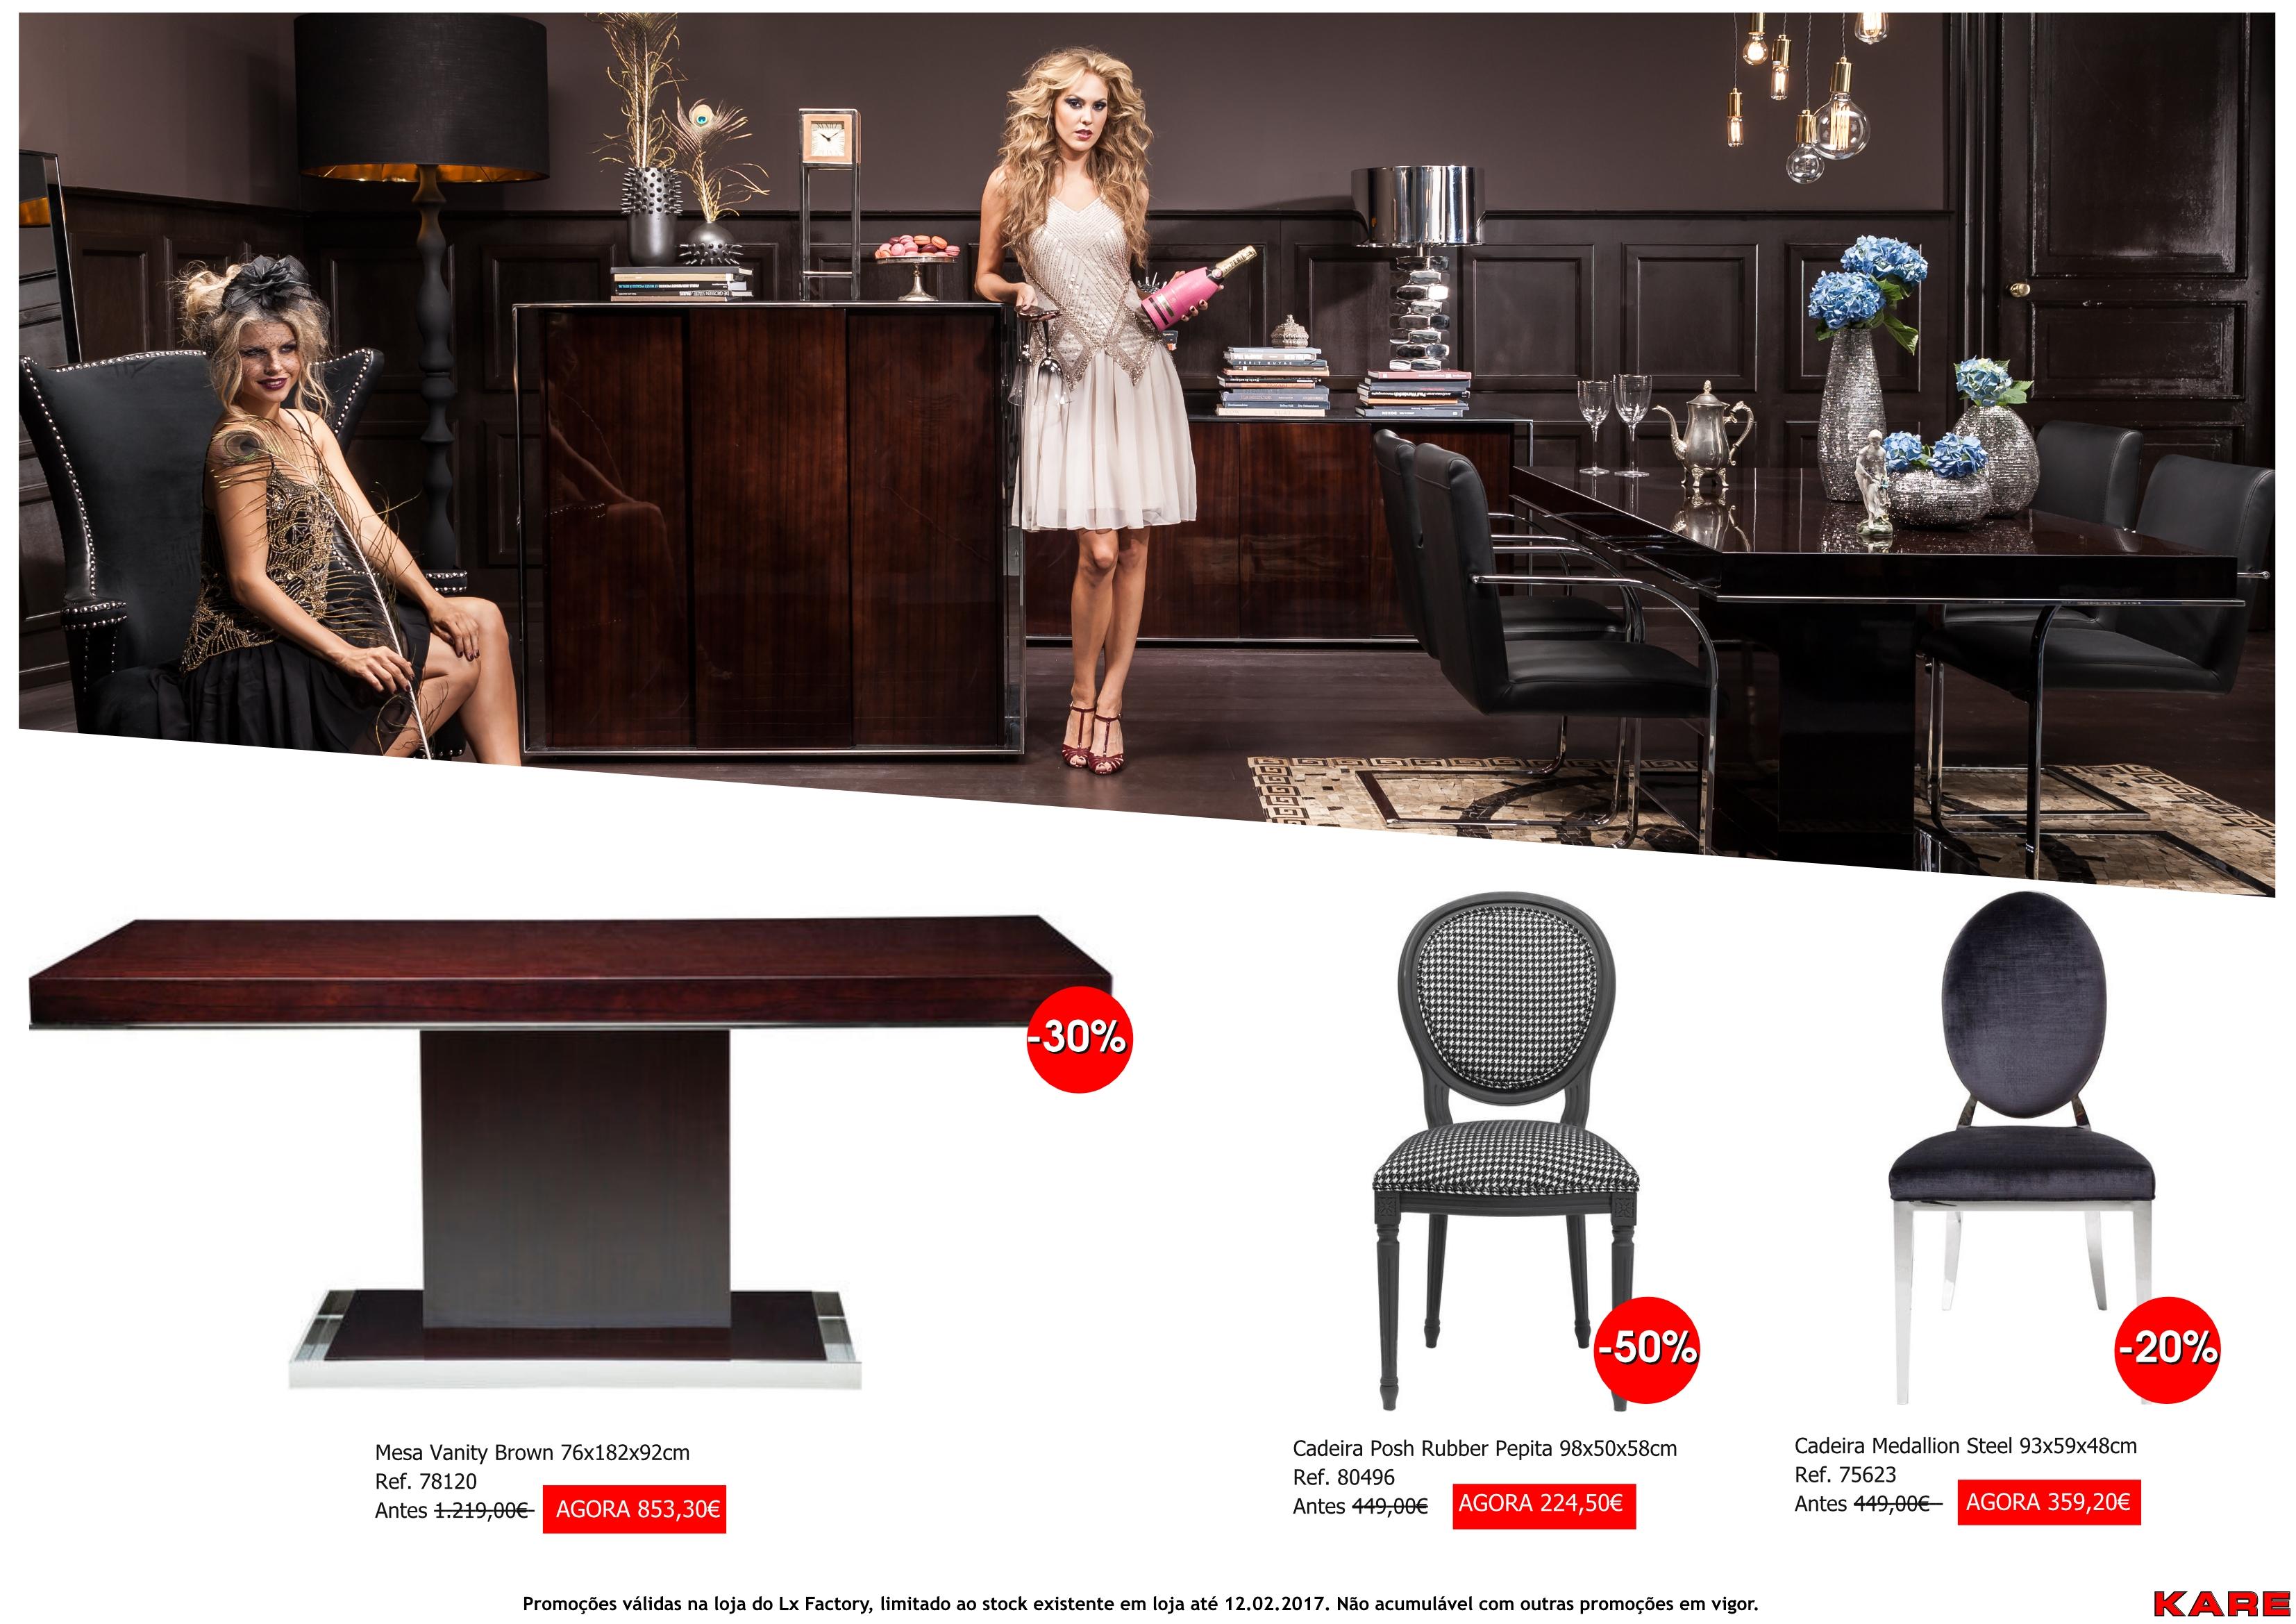 cadeiras e mesa vanity-page005